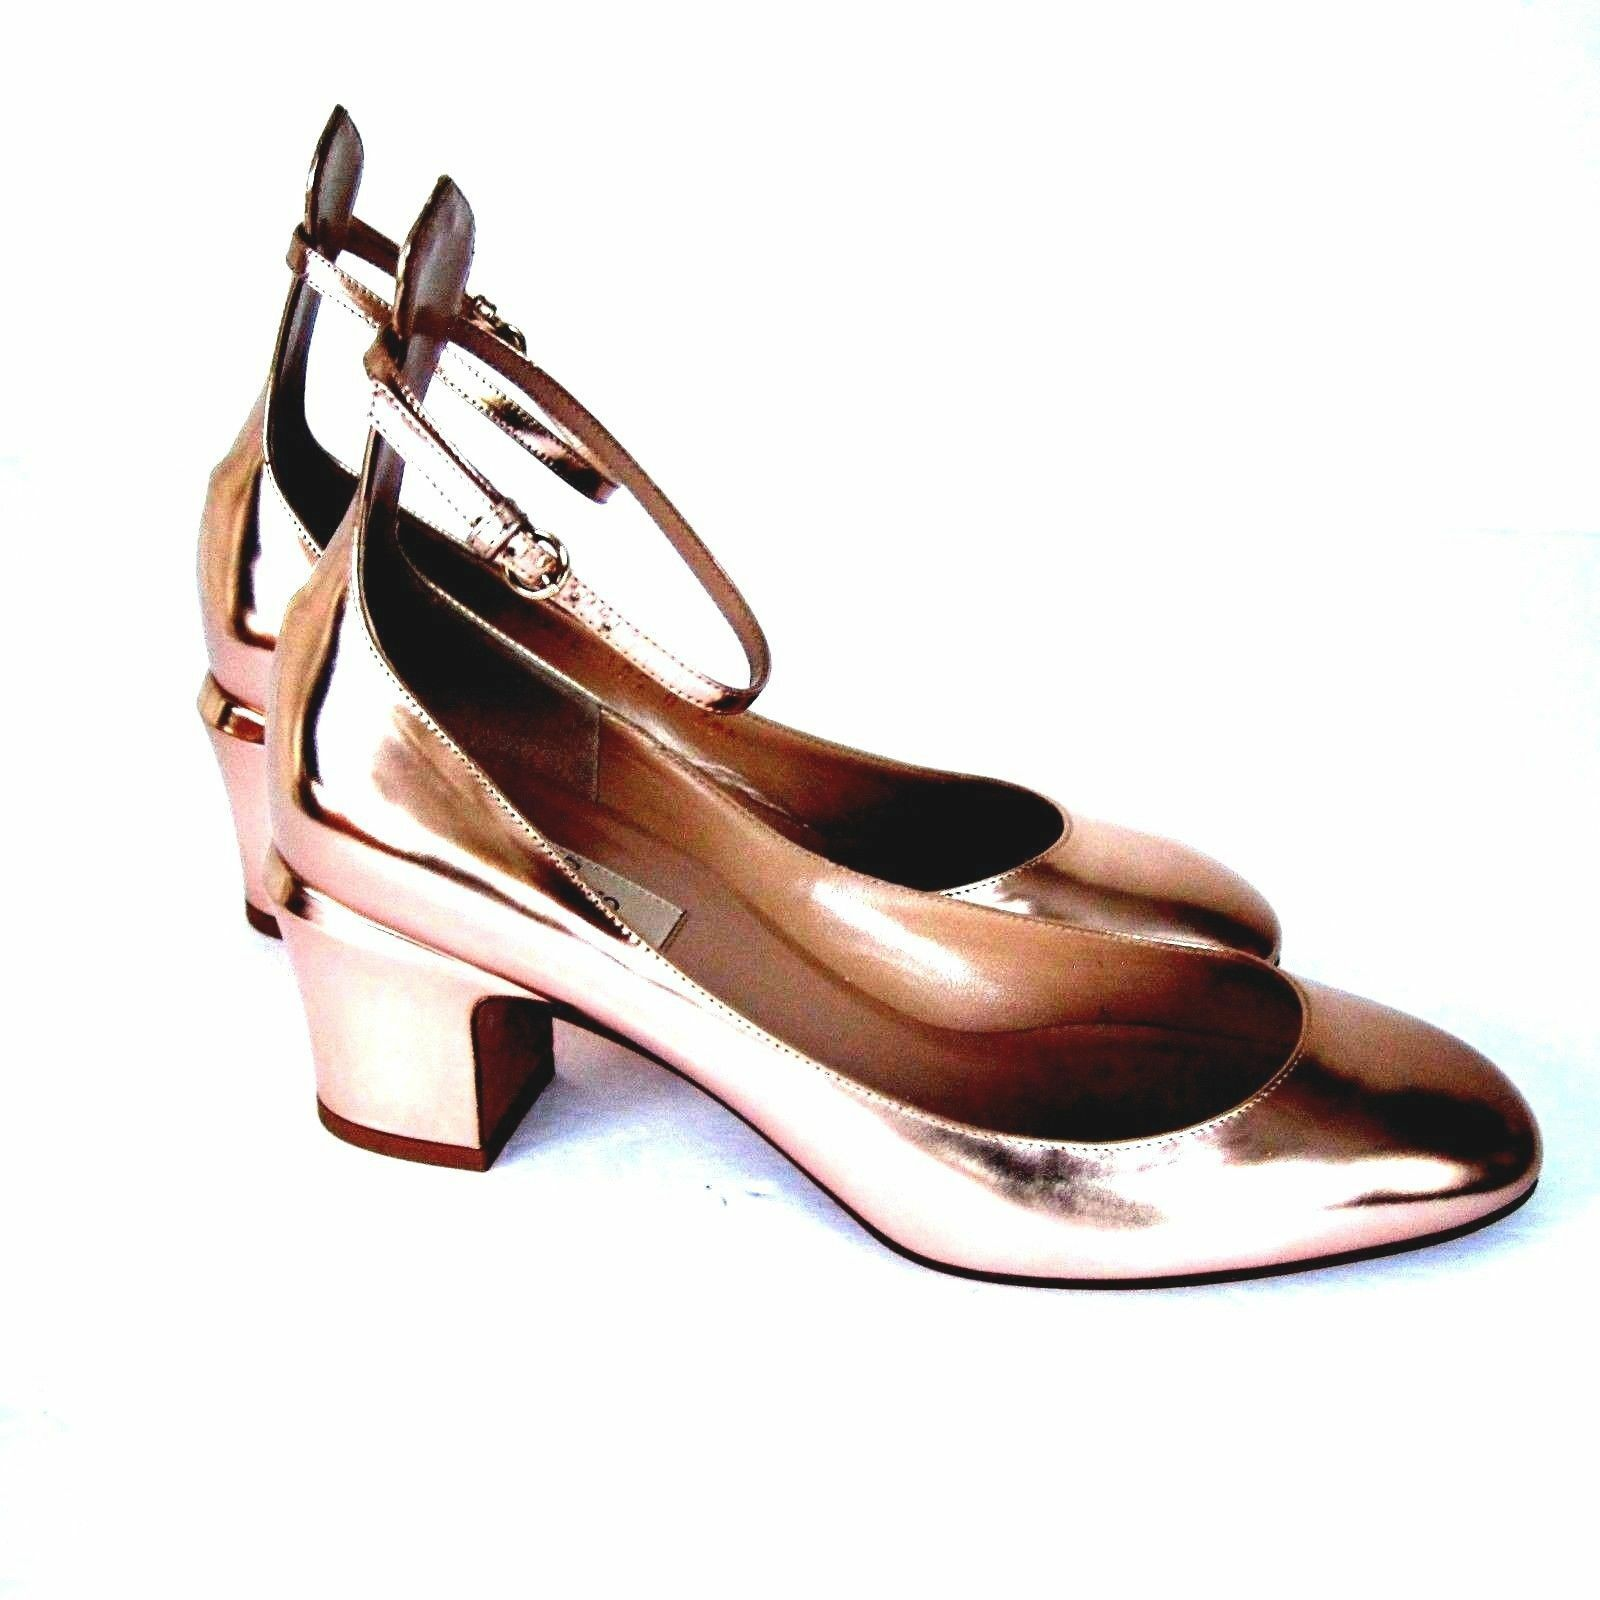 J-2876102 Valentino Garavani Copper Tango Pumps shoes Size US 8.5 Marked 38.5